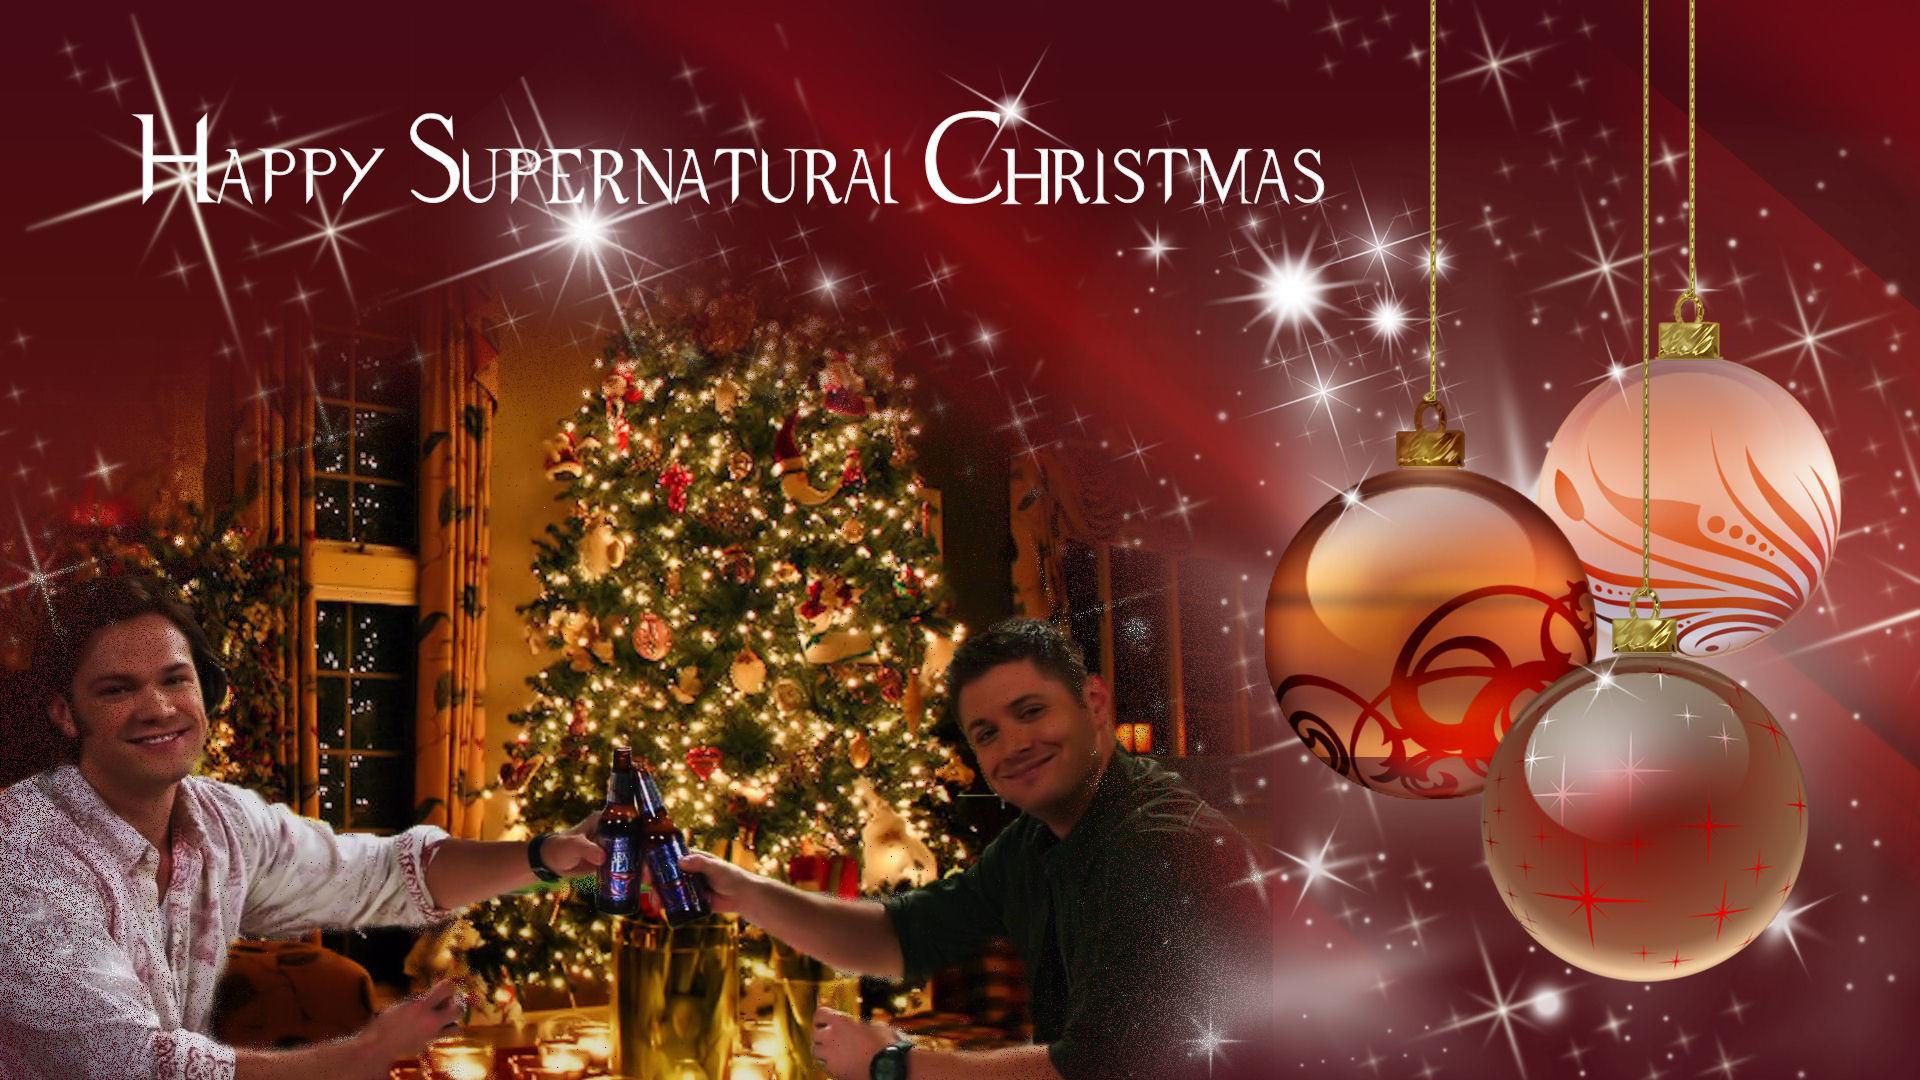 Supernatural Christmas – Supernatural Wallpaper (27992536) – Fanpop